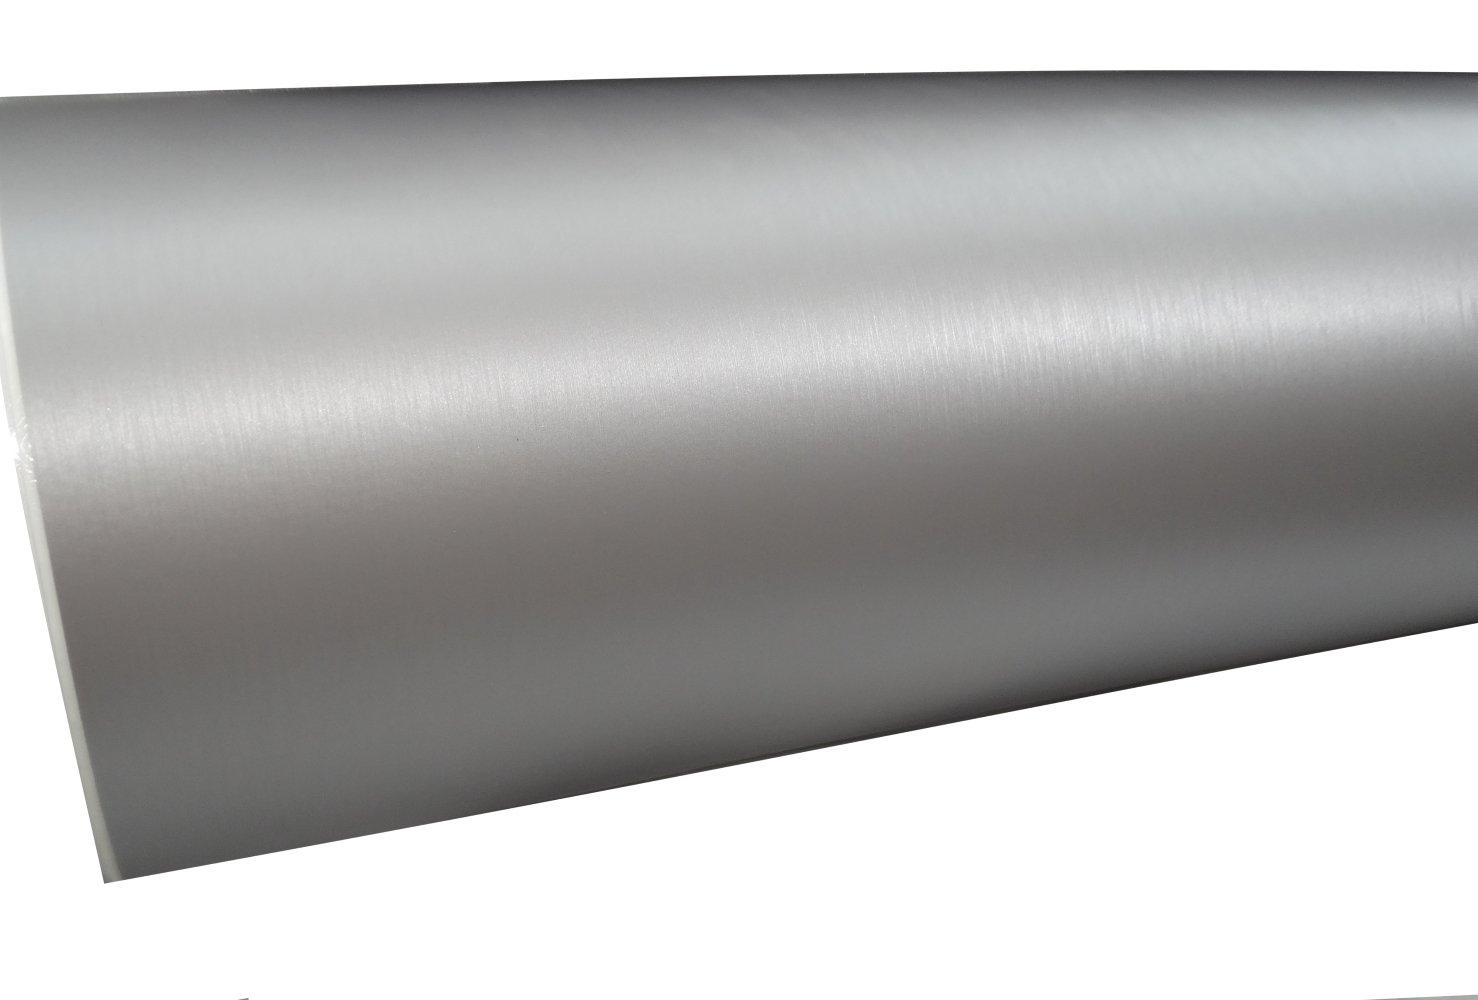 AERZETIX: 152/50cm Pelicula Adhesiva Vinilo Plata Cepillado termoformable Revestimiento de Exterior Interior C17237